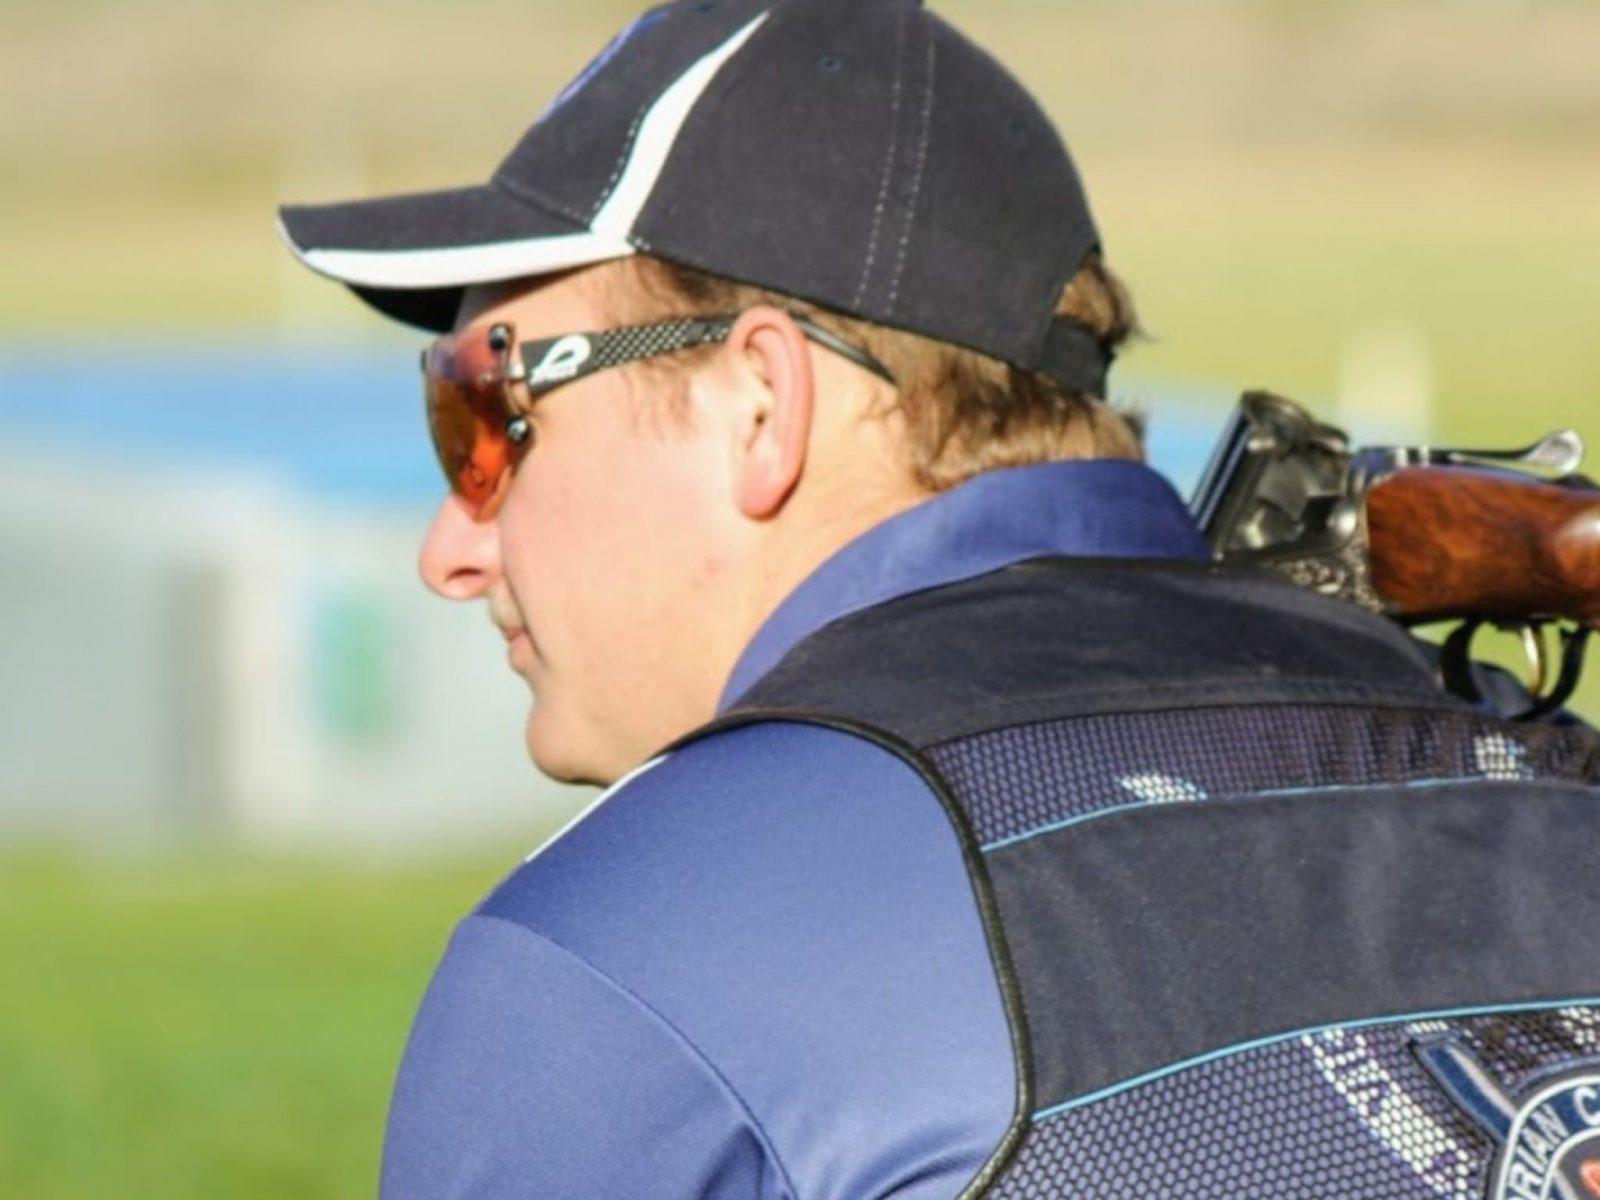 National Trap Championships in Wagga Wagga